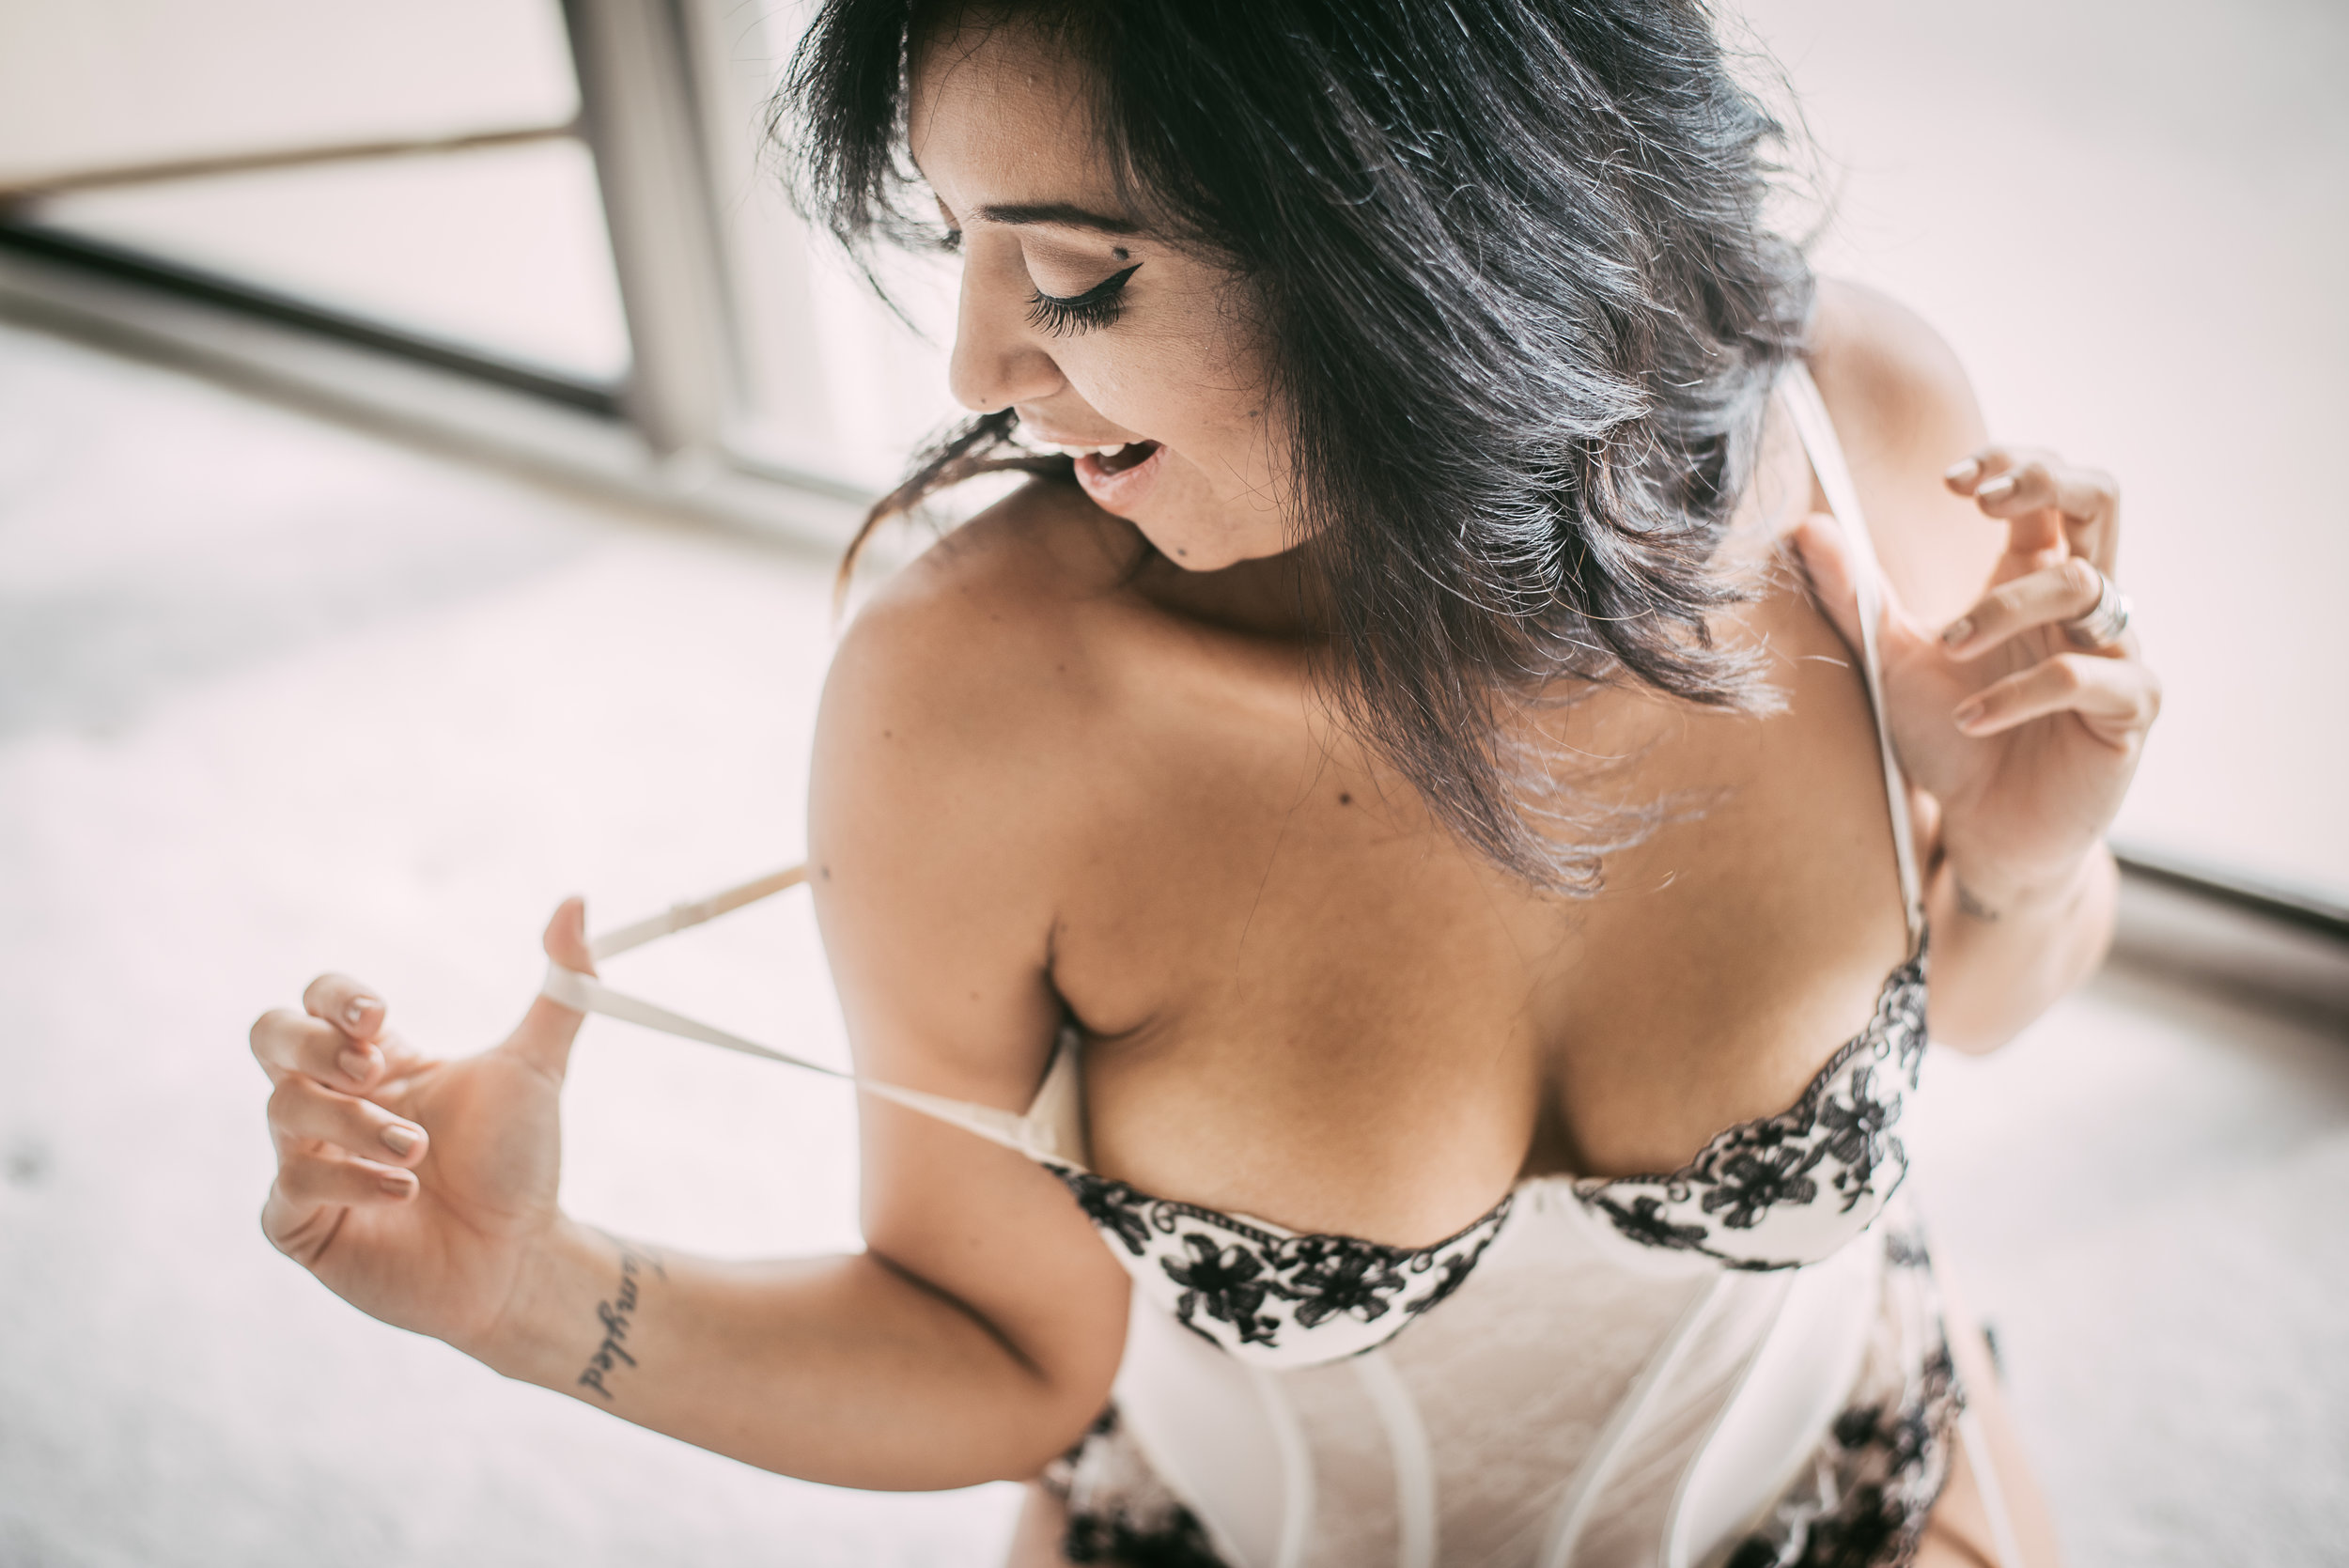 walkiria-boudoir-beauty-photo-session-1-16.jpg